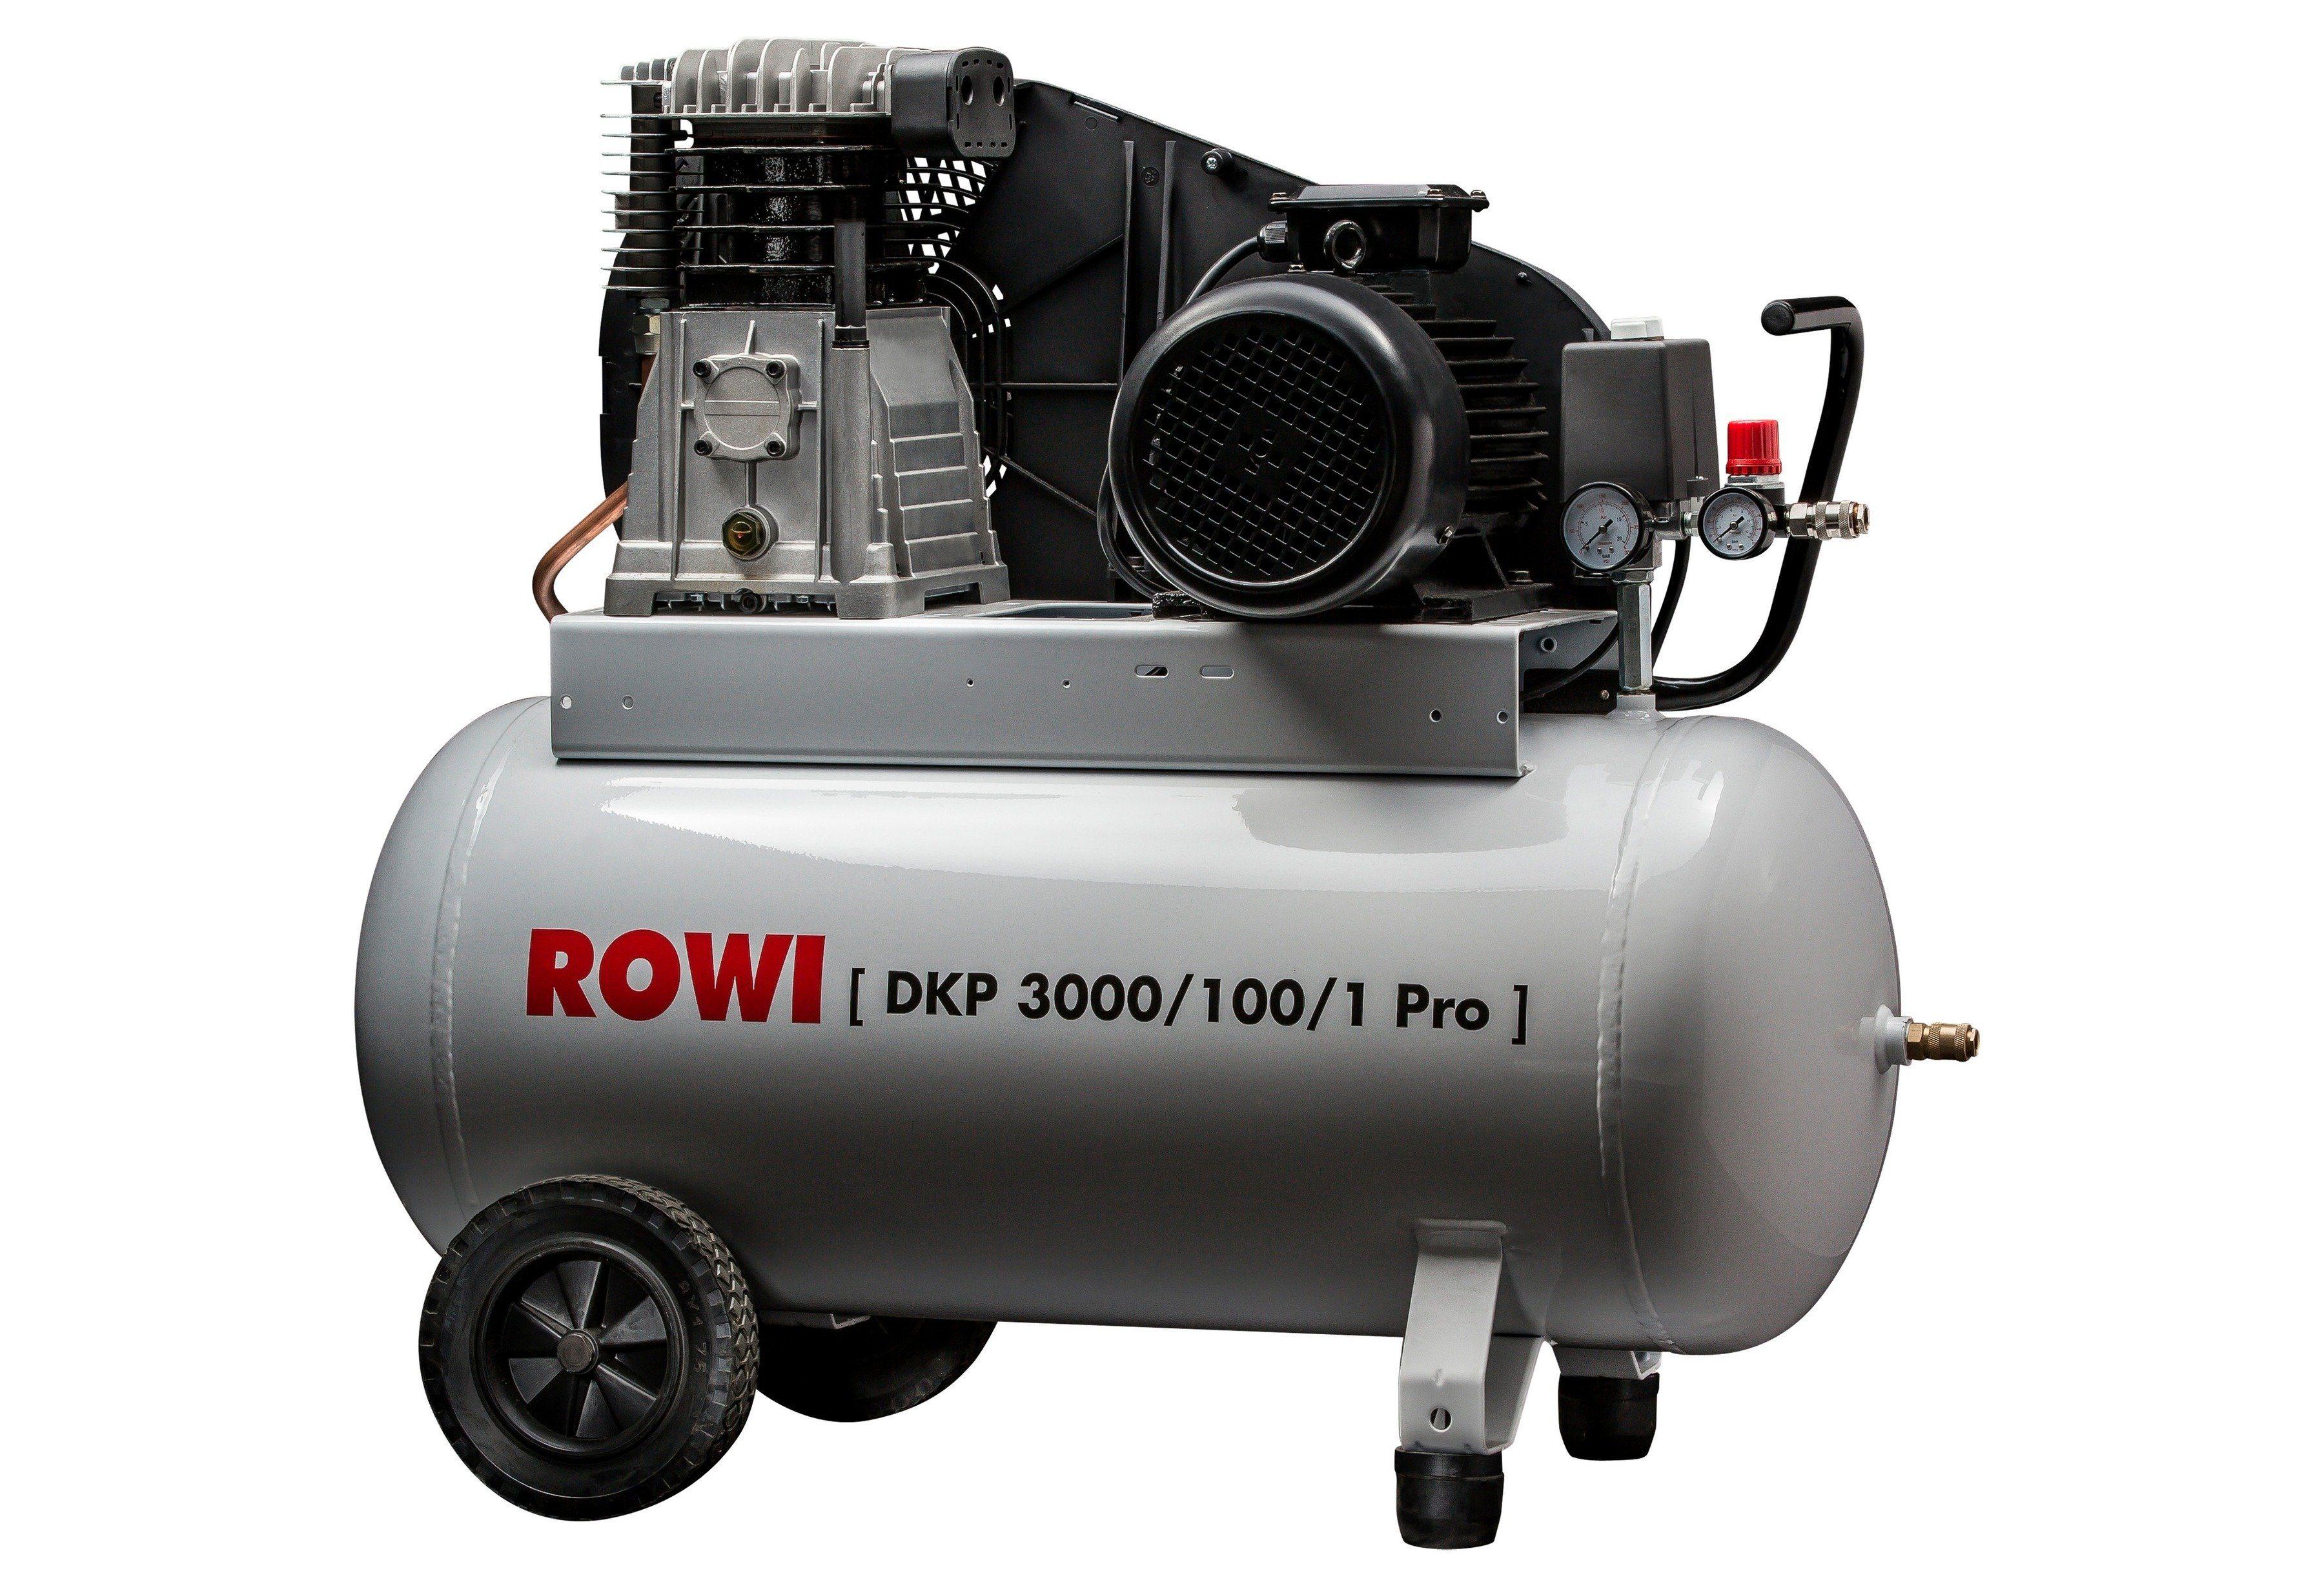 Rowi Kompressor »DKP 3000/100/1 Pro«